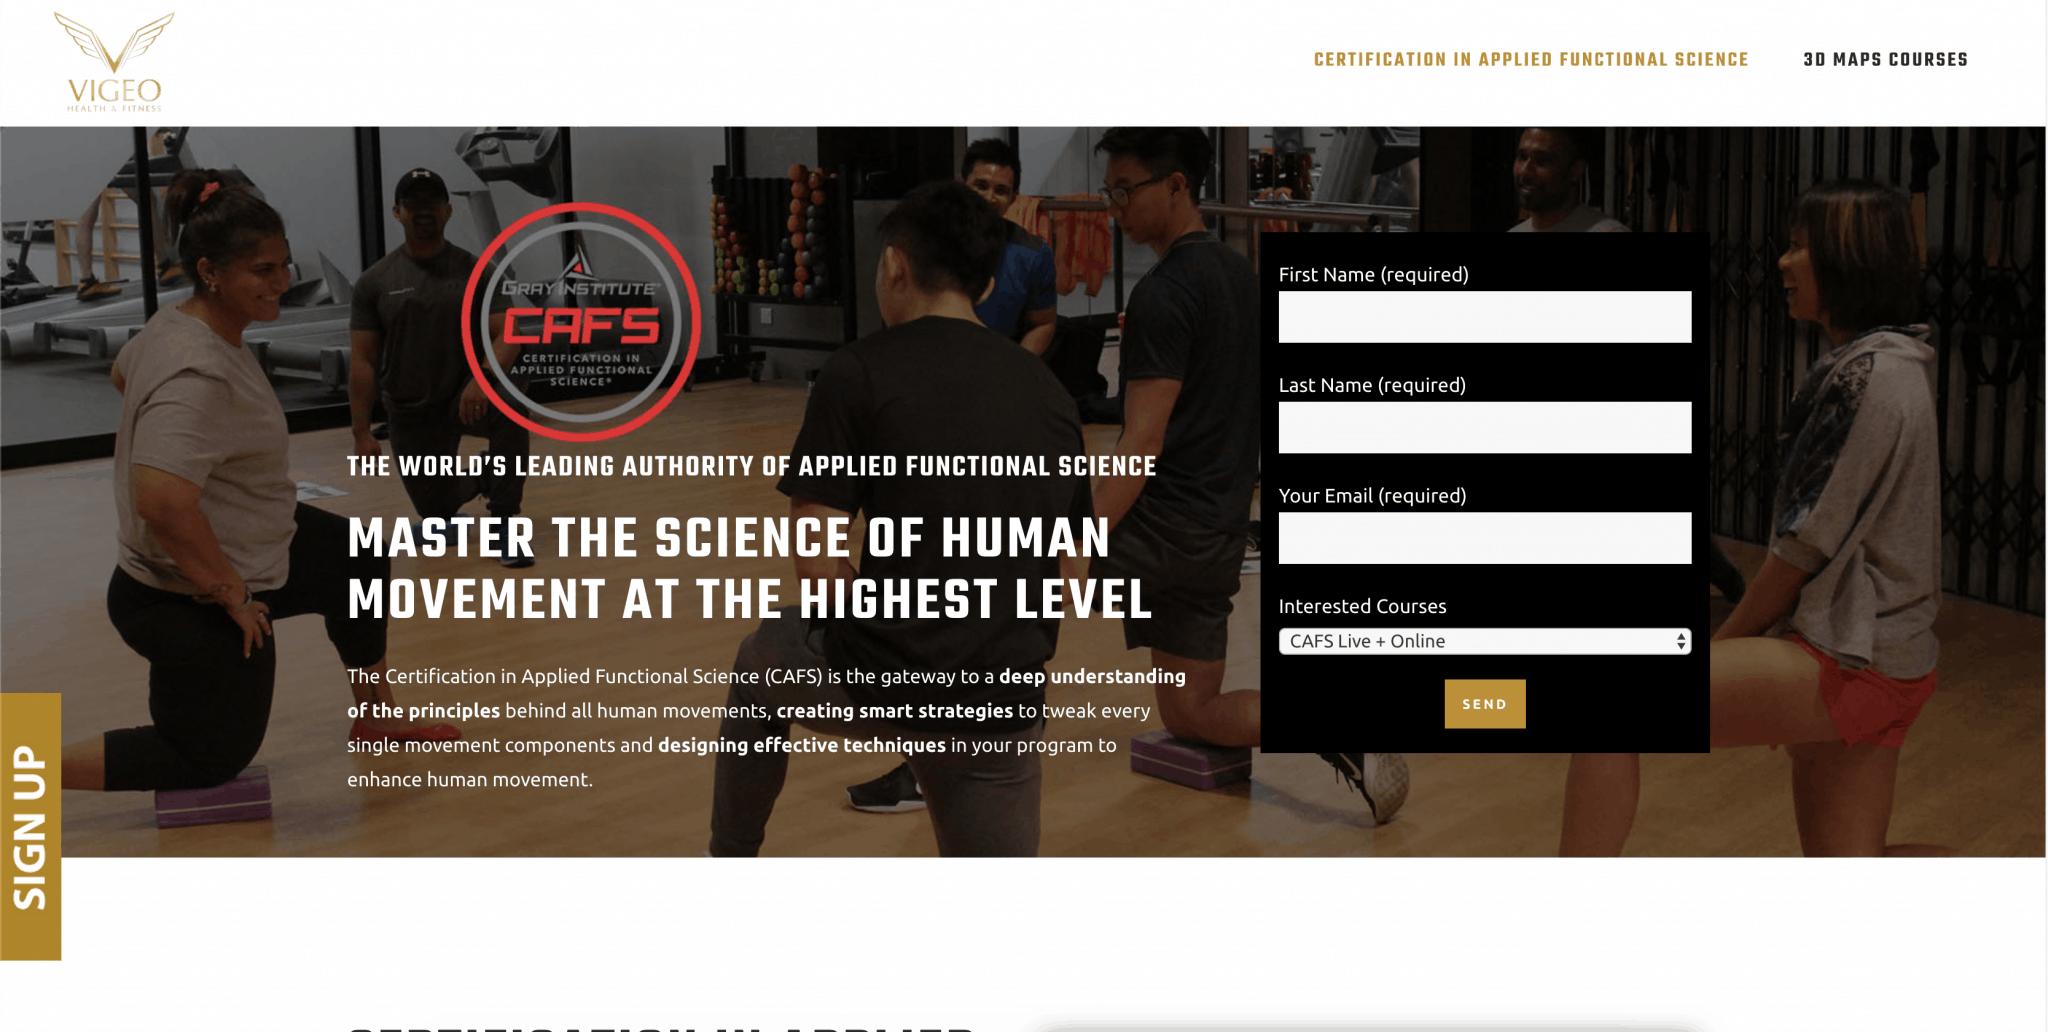 Website Design Services Singapore 123